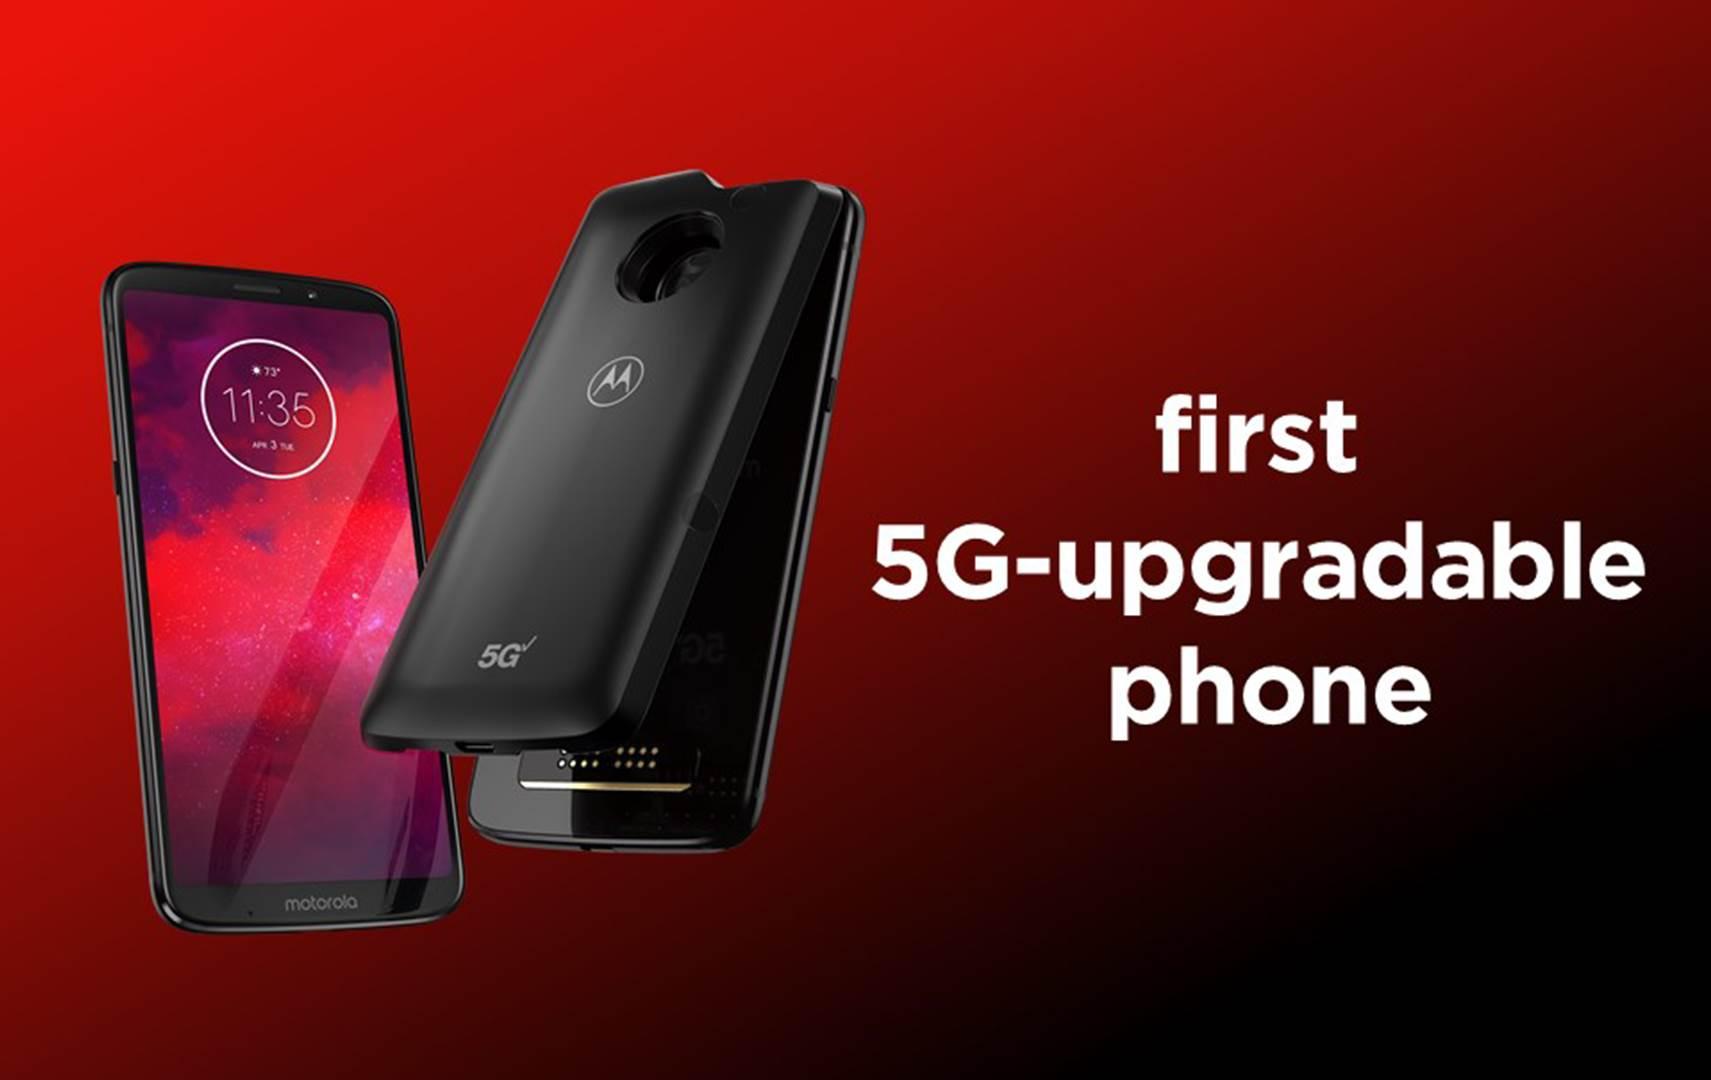 Moto 5G, Motorola Moto Z3, Moto Z3, Moto Mods